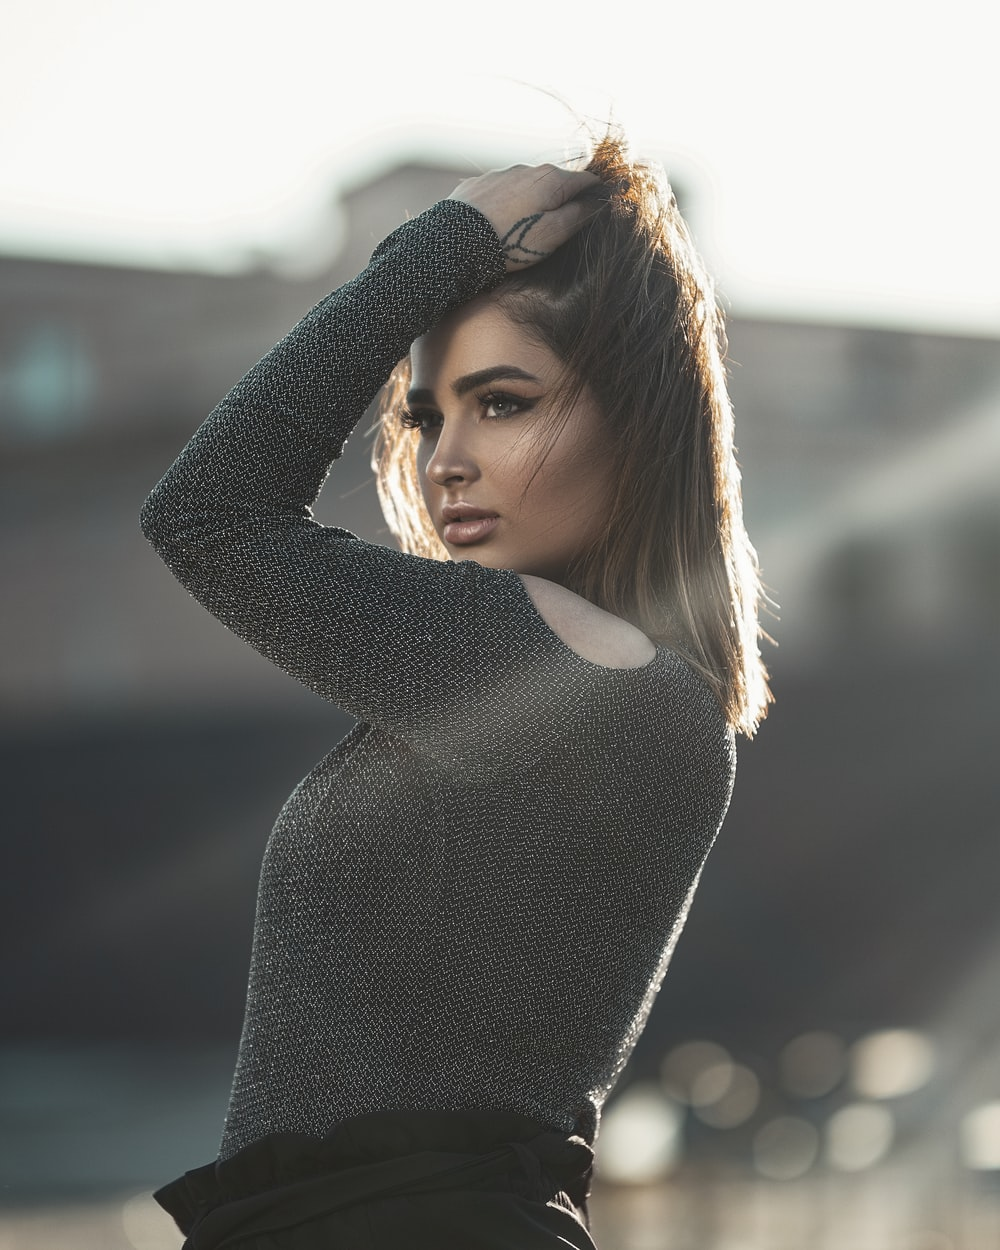 photo shoot of woman touching her hair